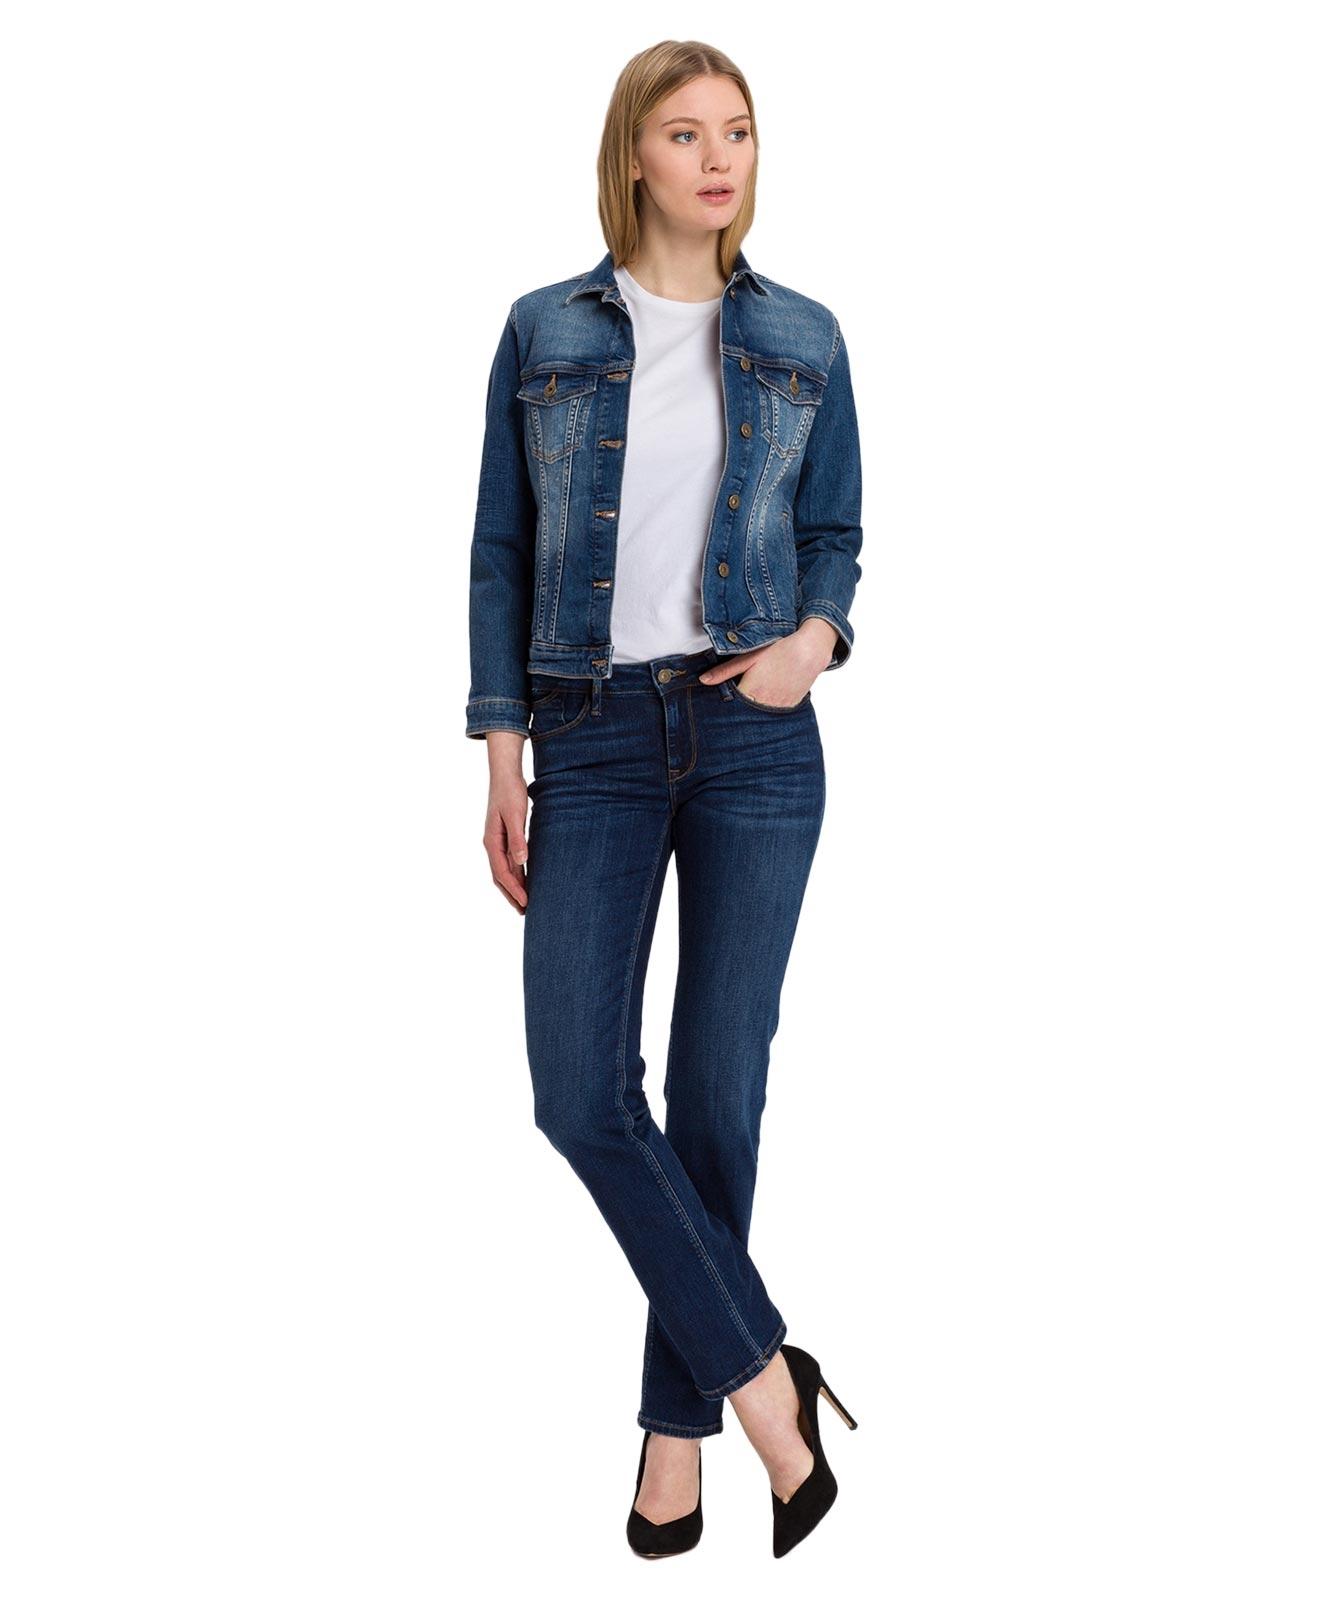 Hosen - Cross Straight Leg Jeans Rose in Dark Blue Used  - Onlineshop Jeans Meile